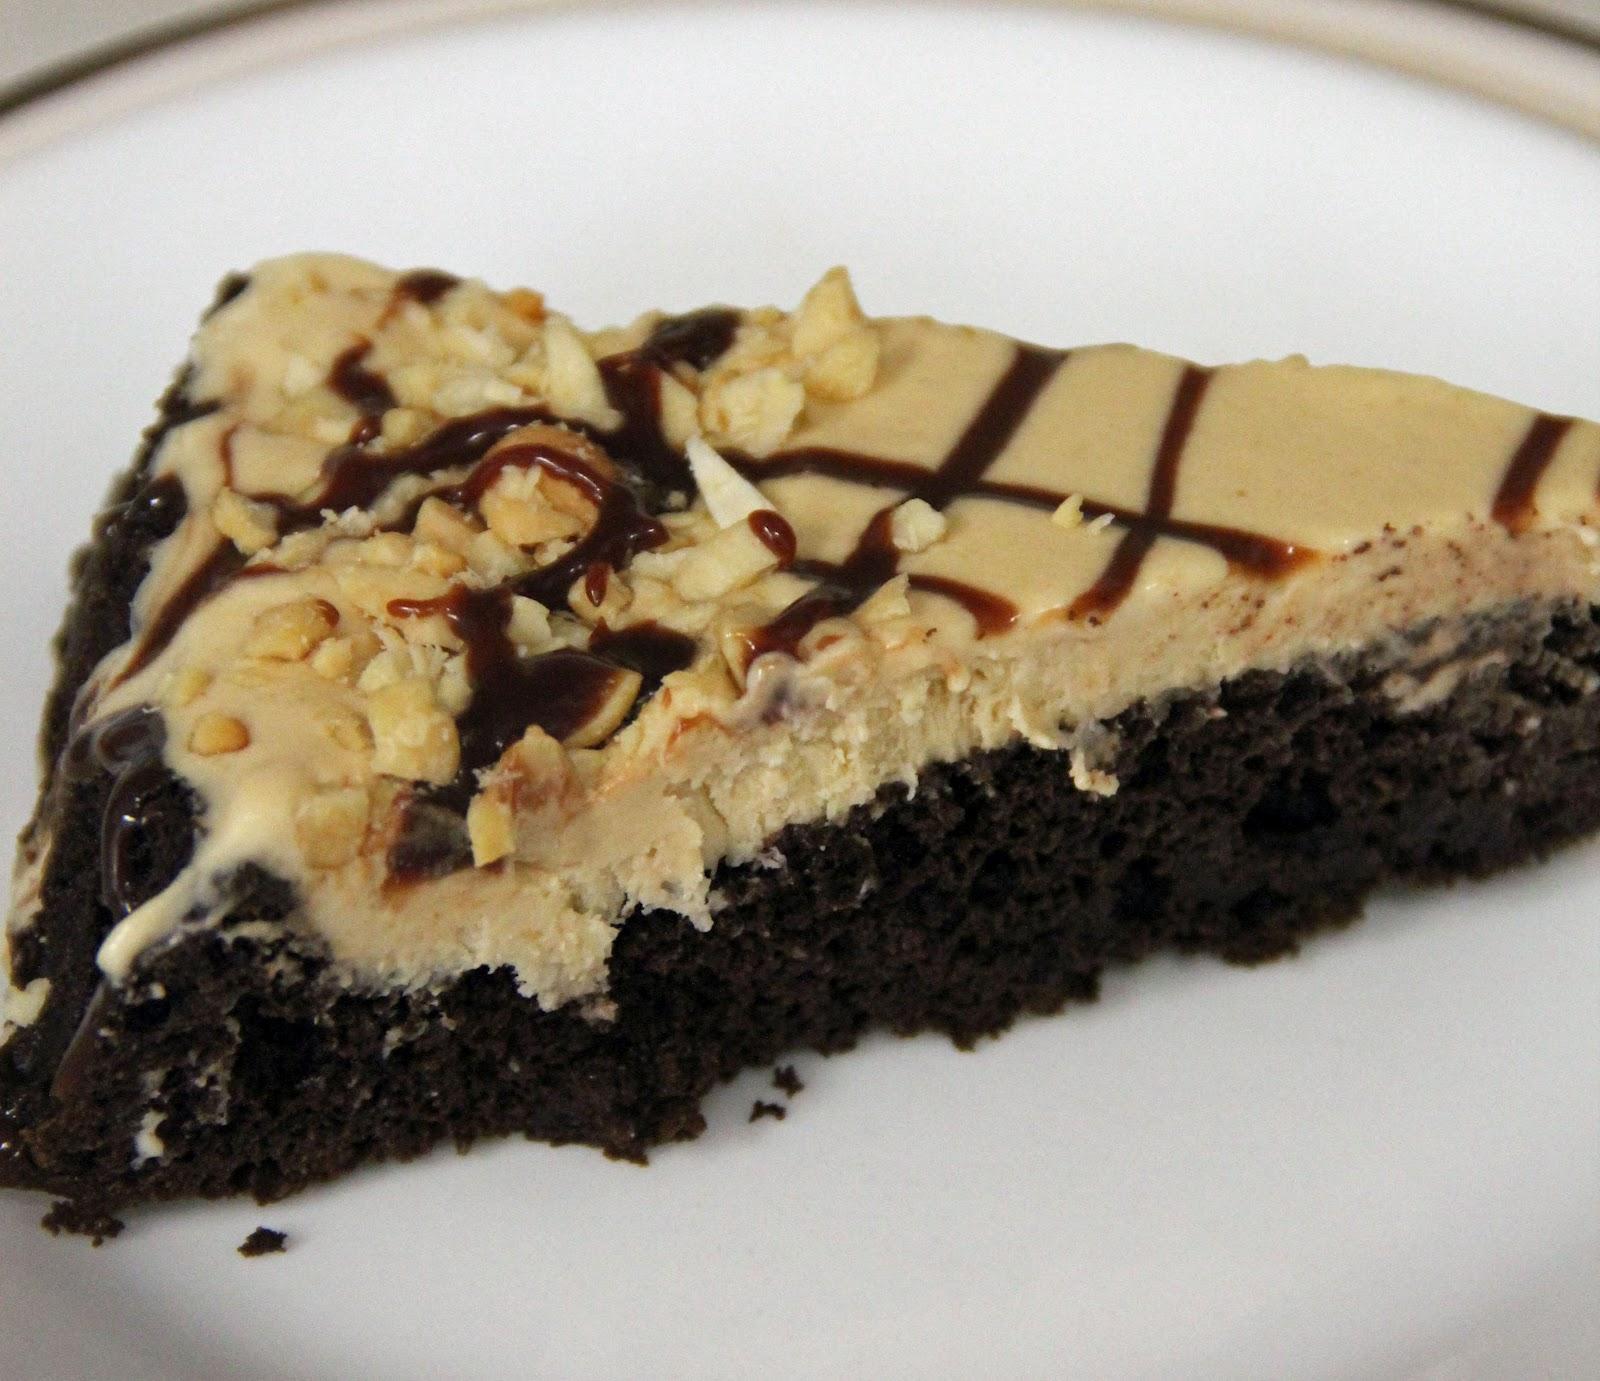 Salted Peanut Butter & Honey Ice Cream in a Chocolate Cake Tart